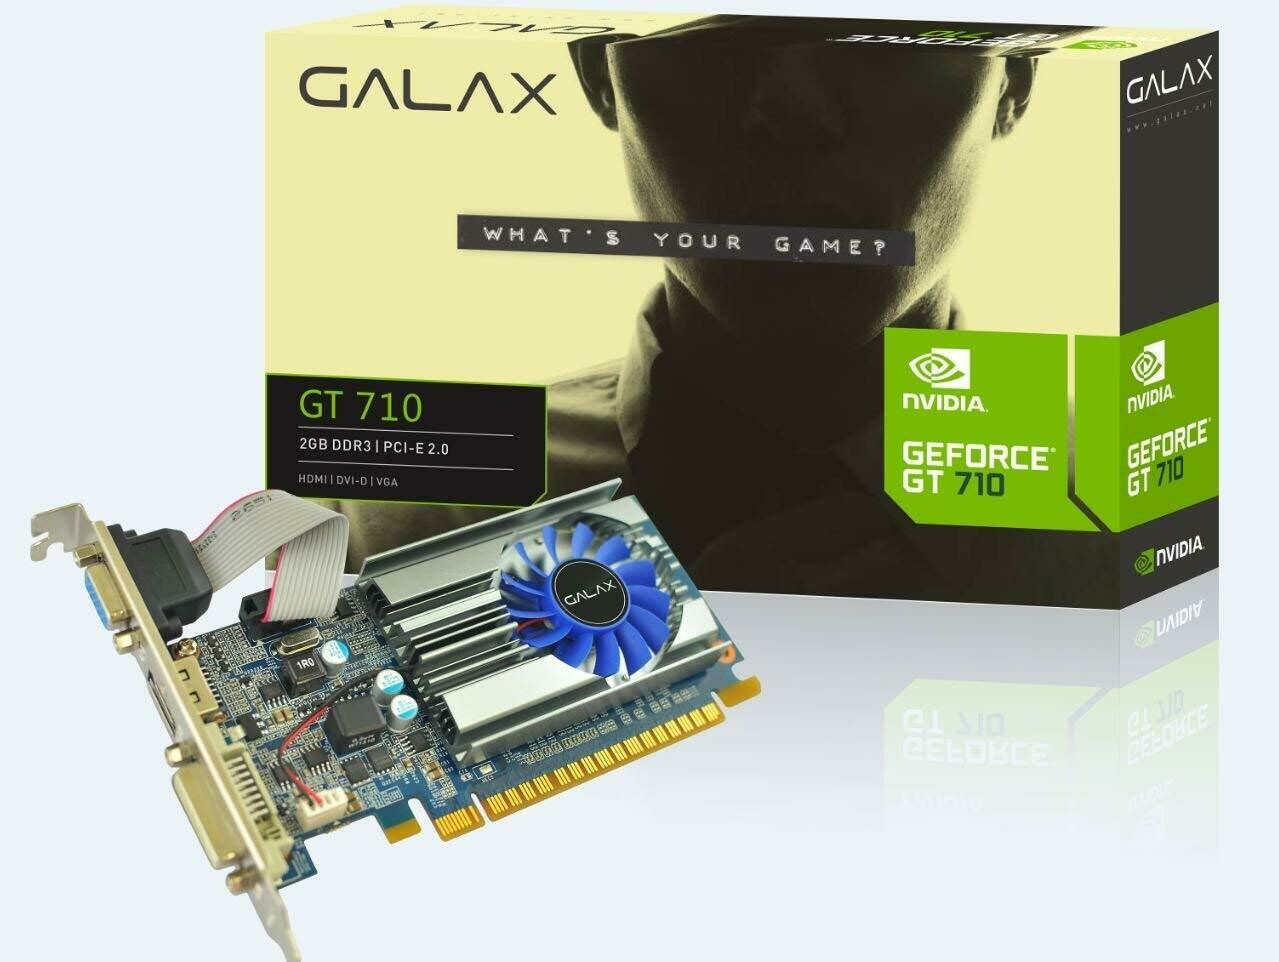 GALAX GEFORCE GT 710 2GB DDR3 64-bit HDMI/DVI-D/VGA Graphic Card